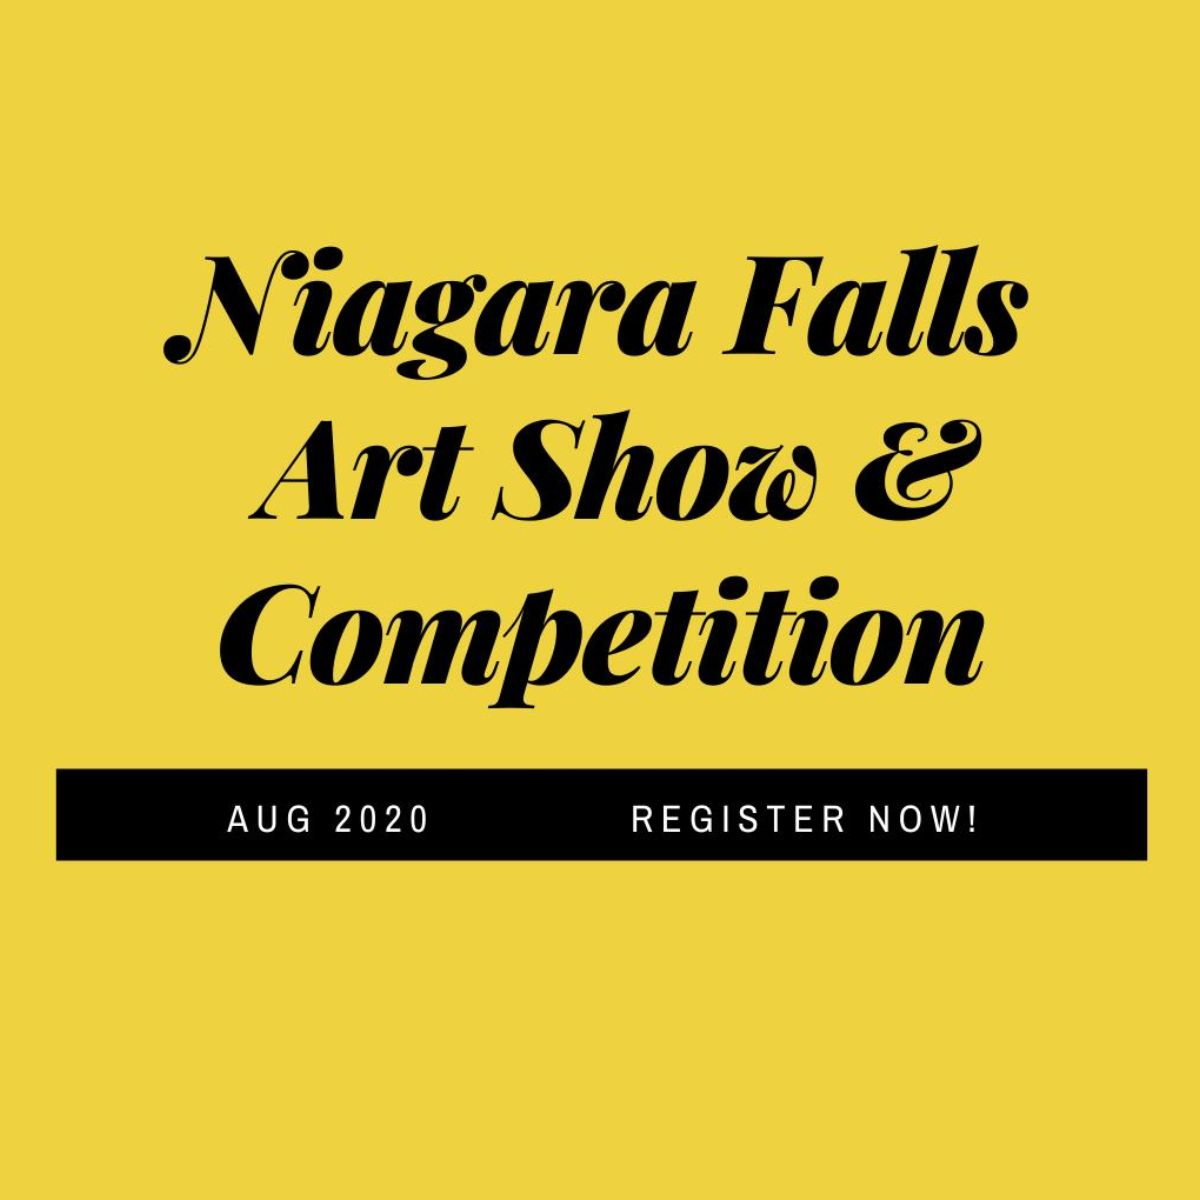 """Niagara Falls Art Show & Competition. Aug 2020. Register now!"""